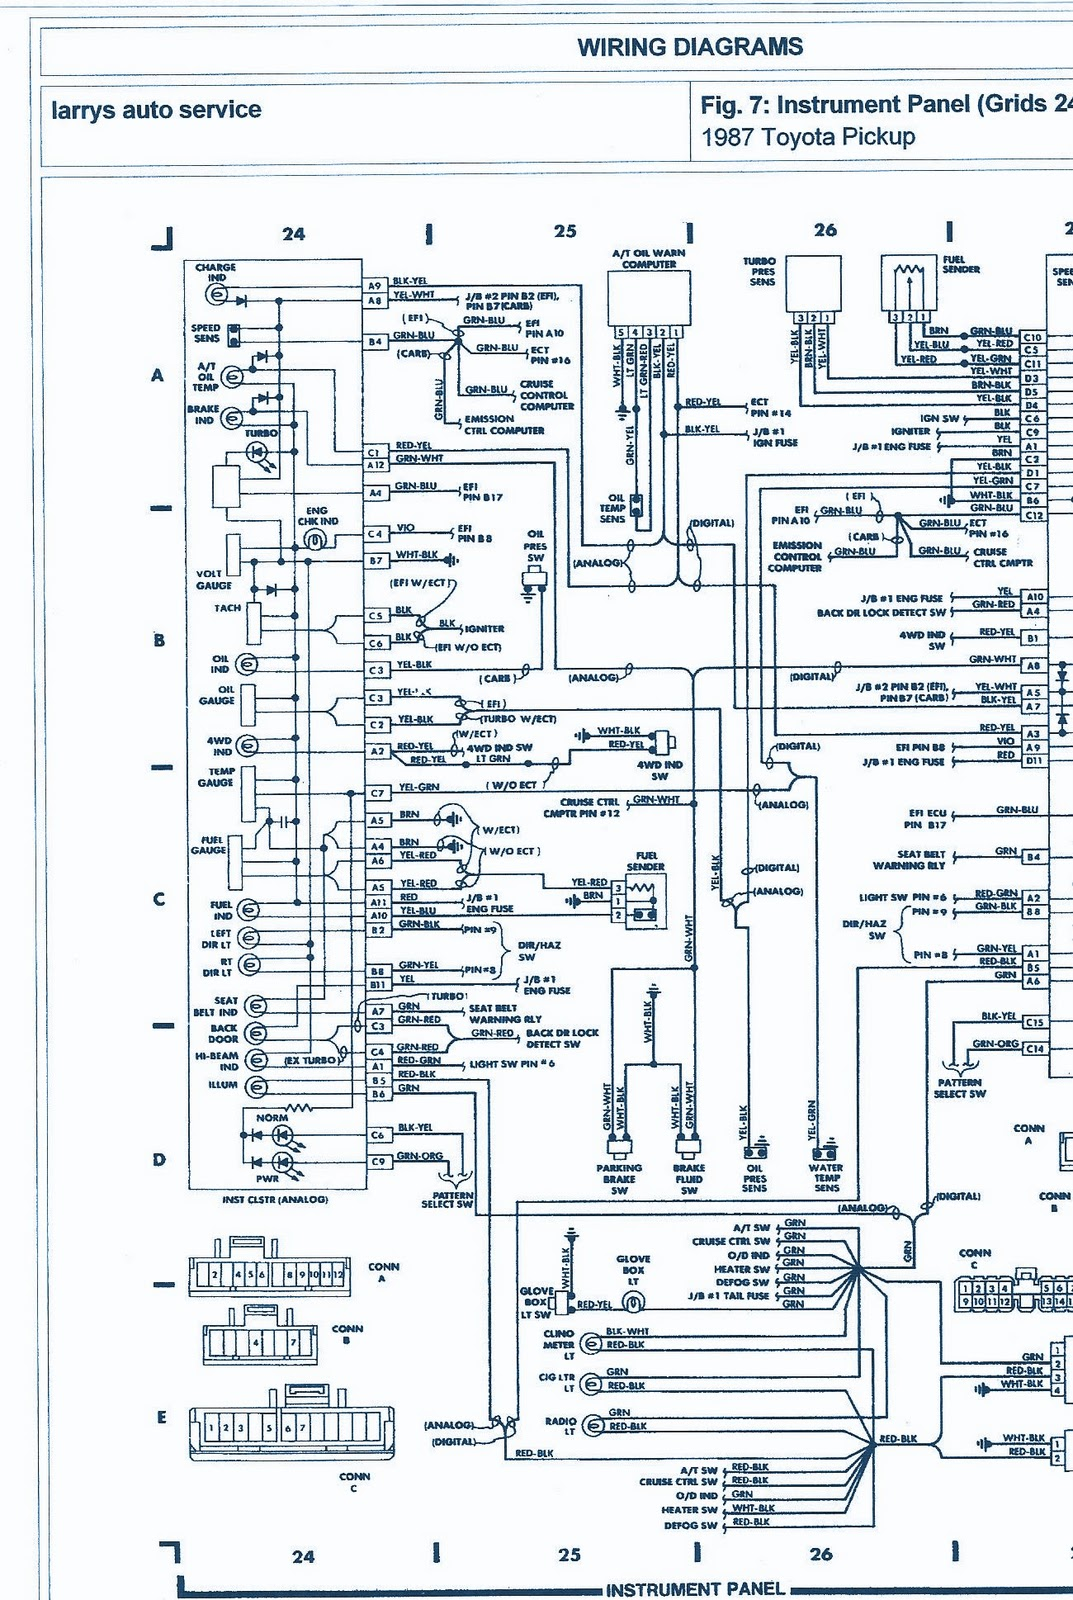 1985 Toyota Ecu Wiring Diagram Electrical Diagrams Sr20de 1994 Pickup Power Window Harness Diy Enthusiasts 92